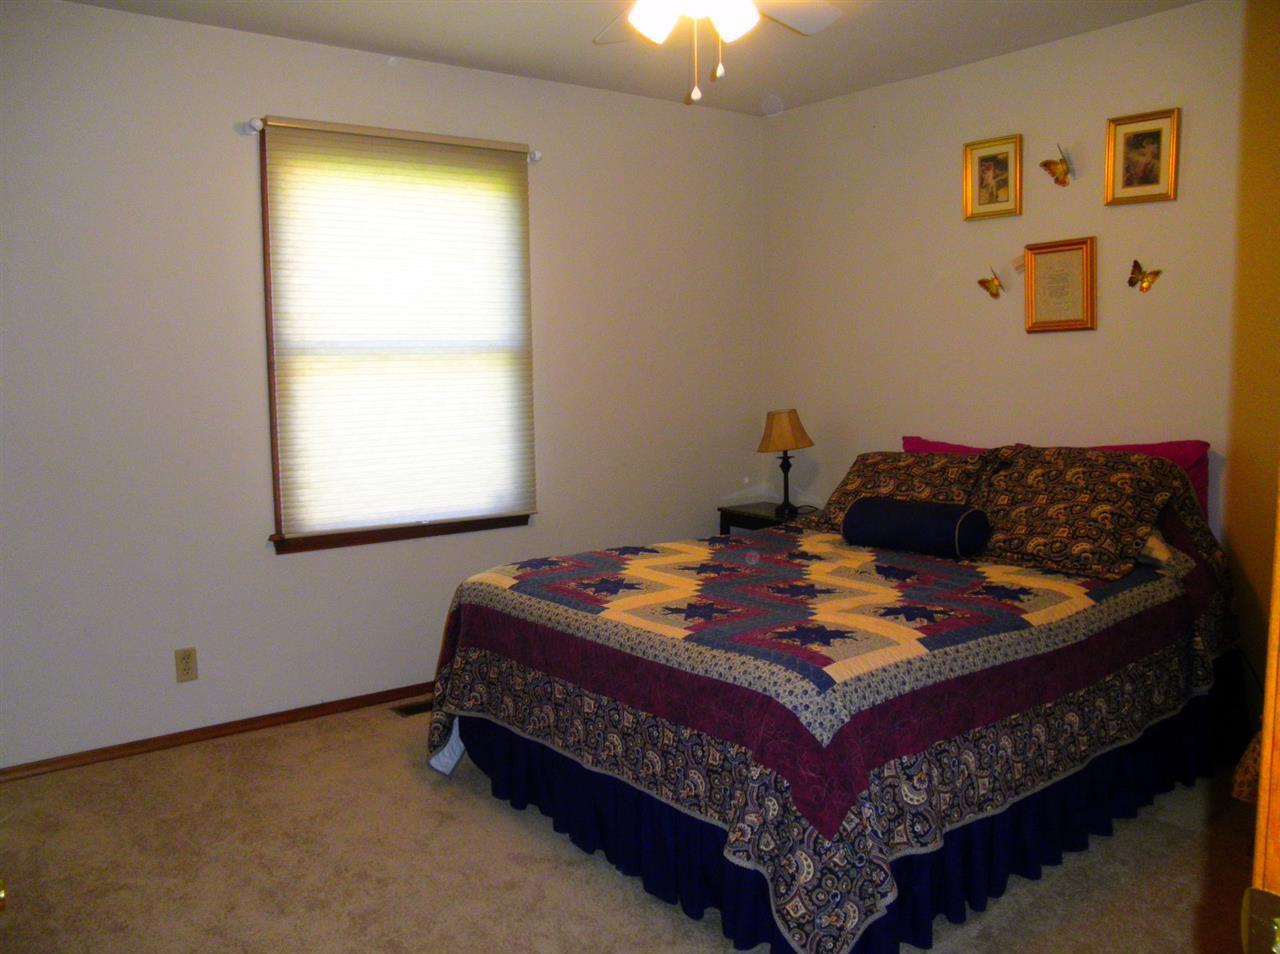 Sold Cross Sale W/ MLS | 32 Raintree Ponca City, OK 74604 12